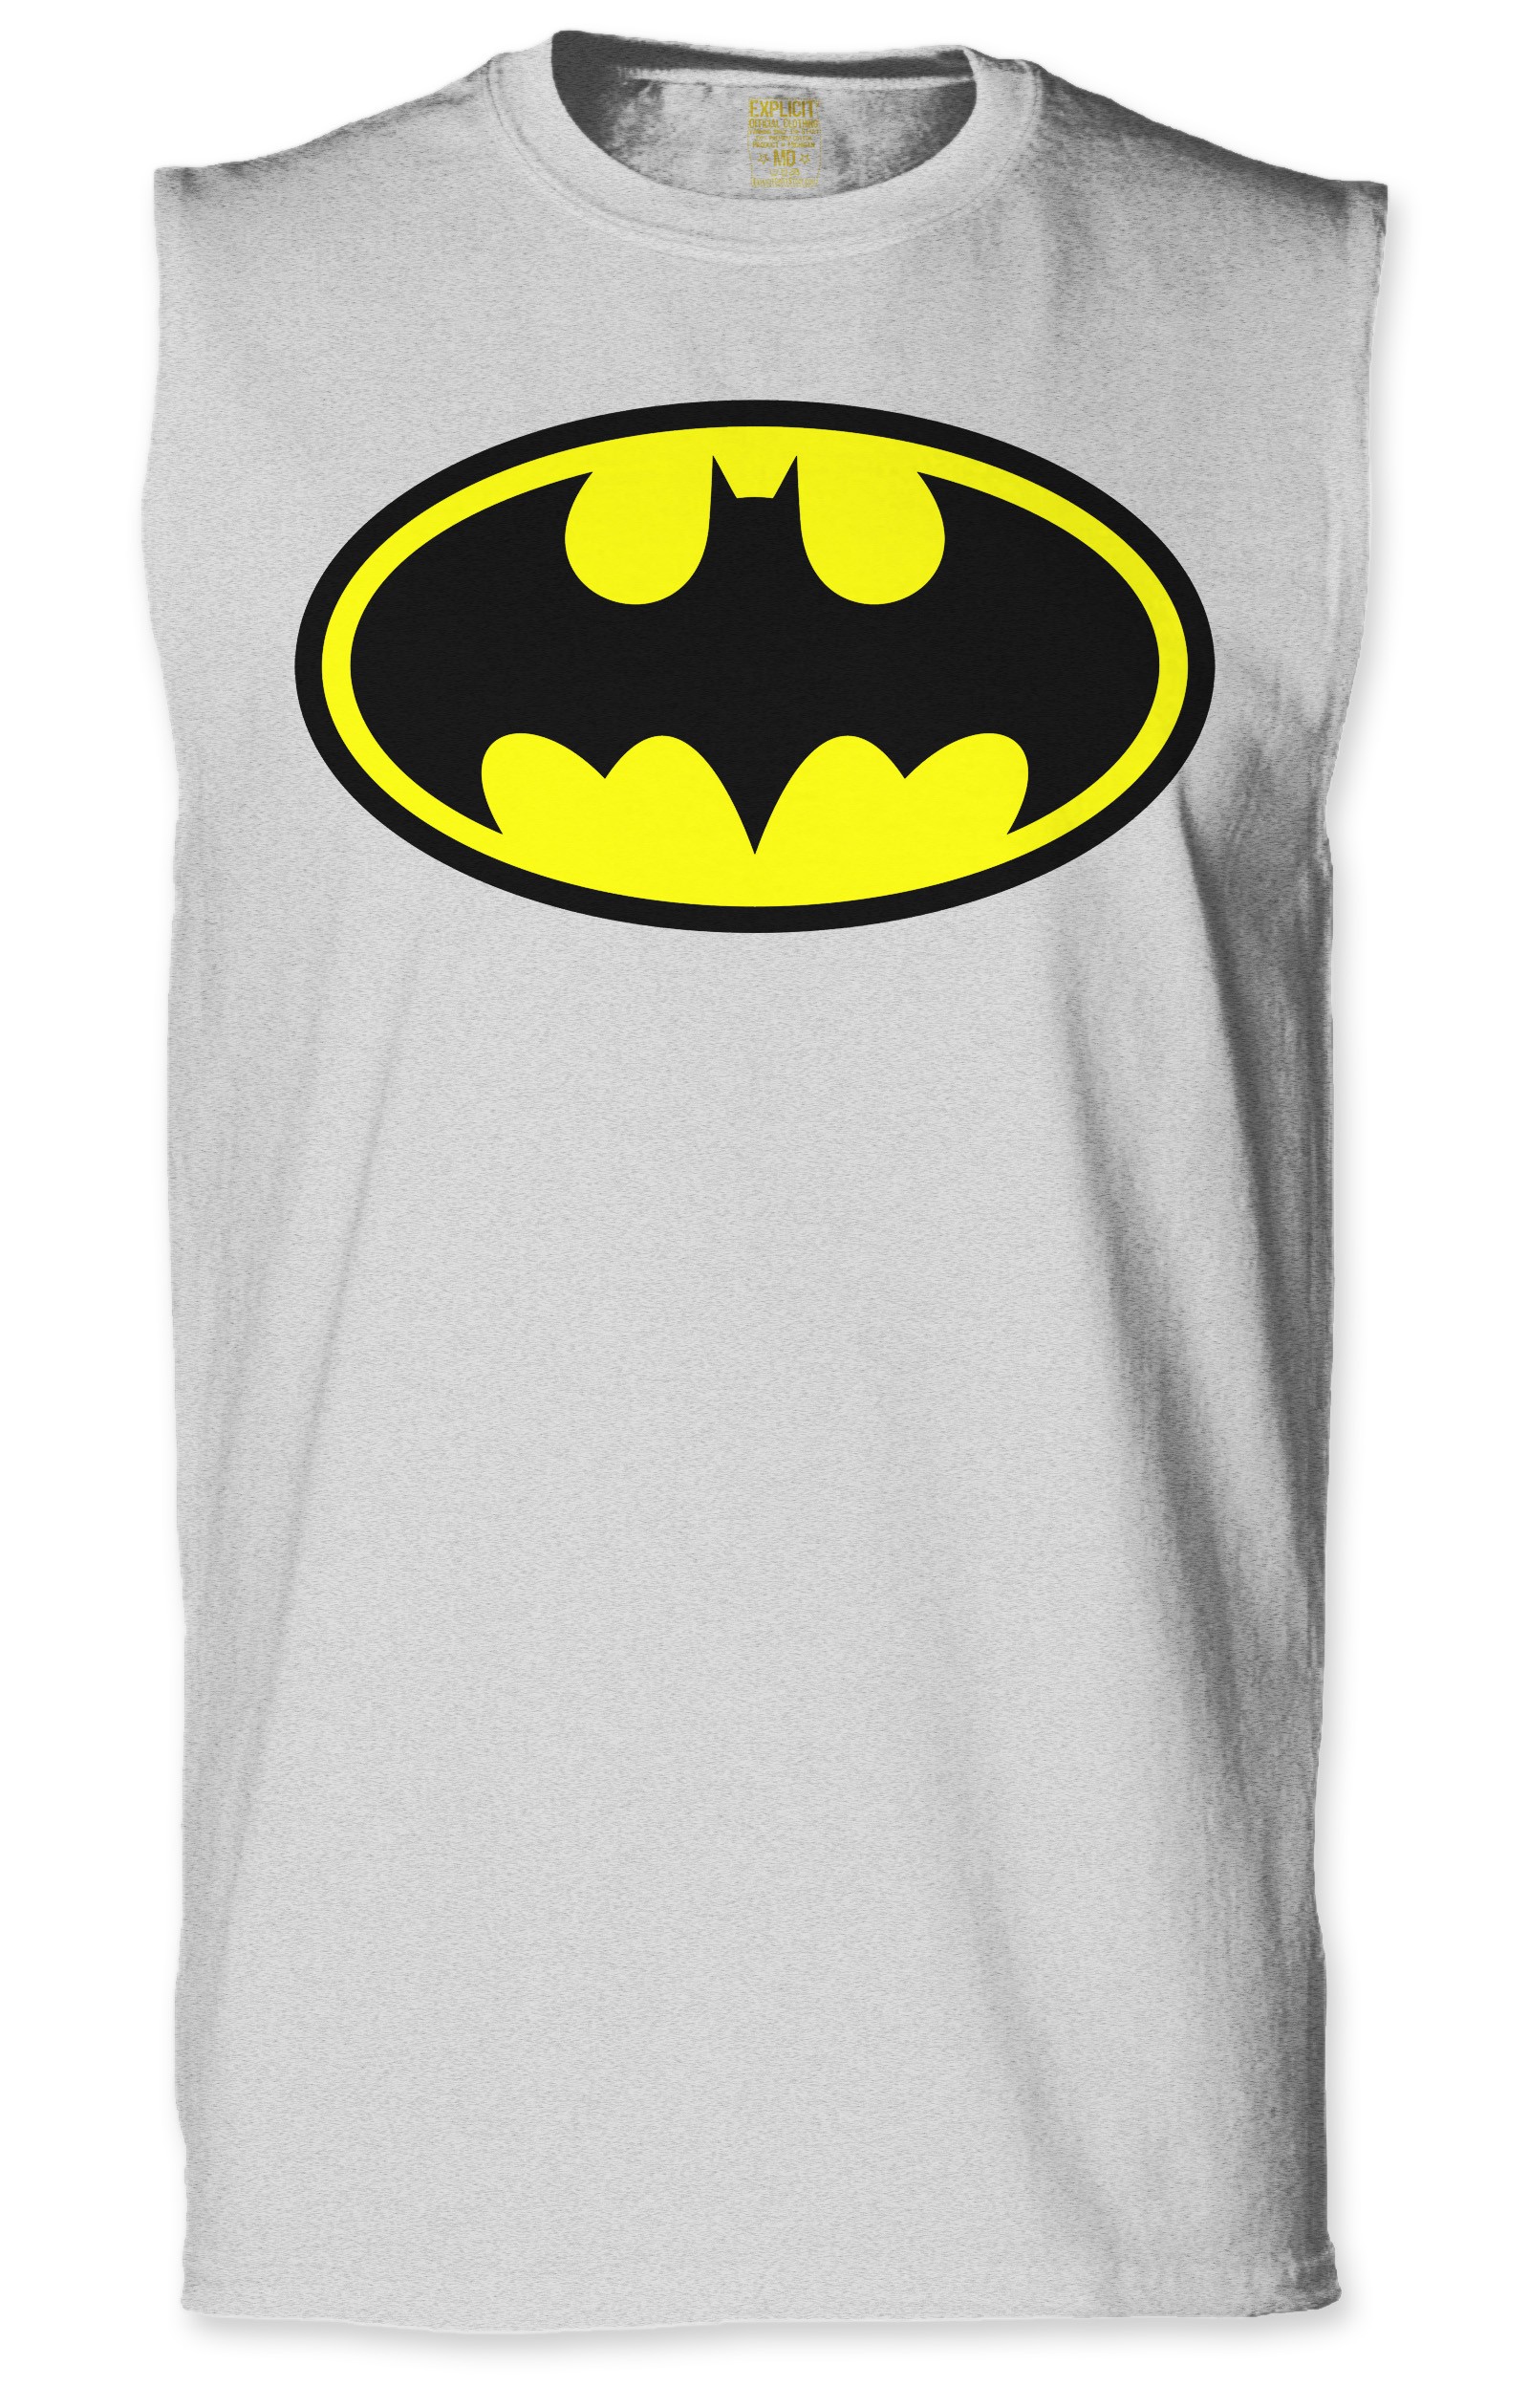 8 NEW Camo /& Black Batman Boys Muscle Shirt Size Medium